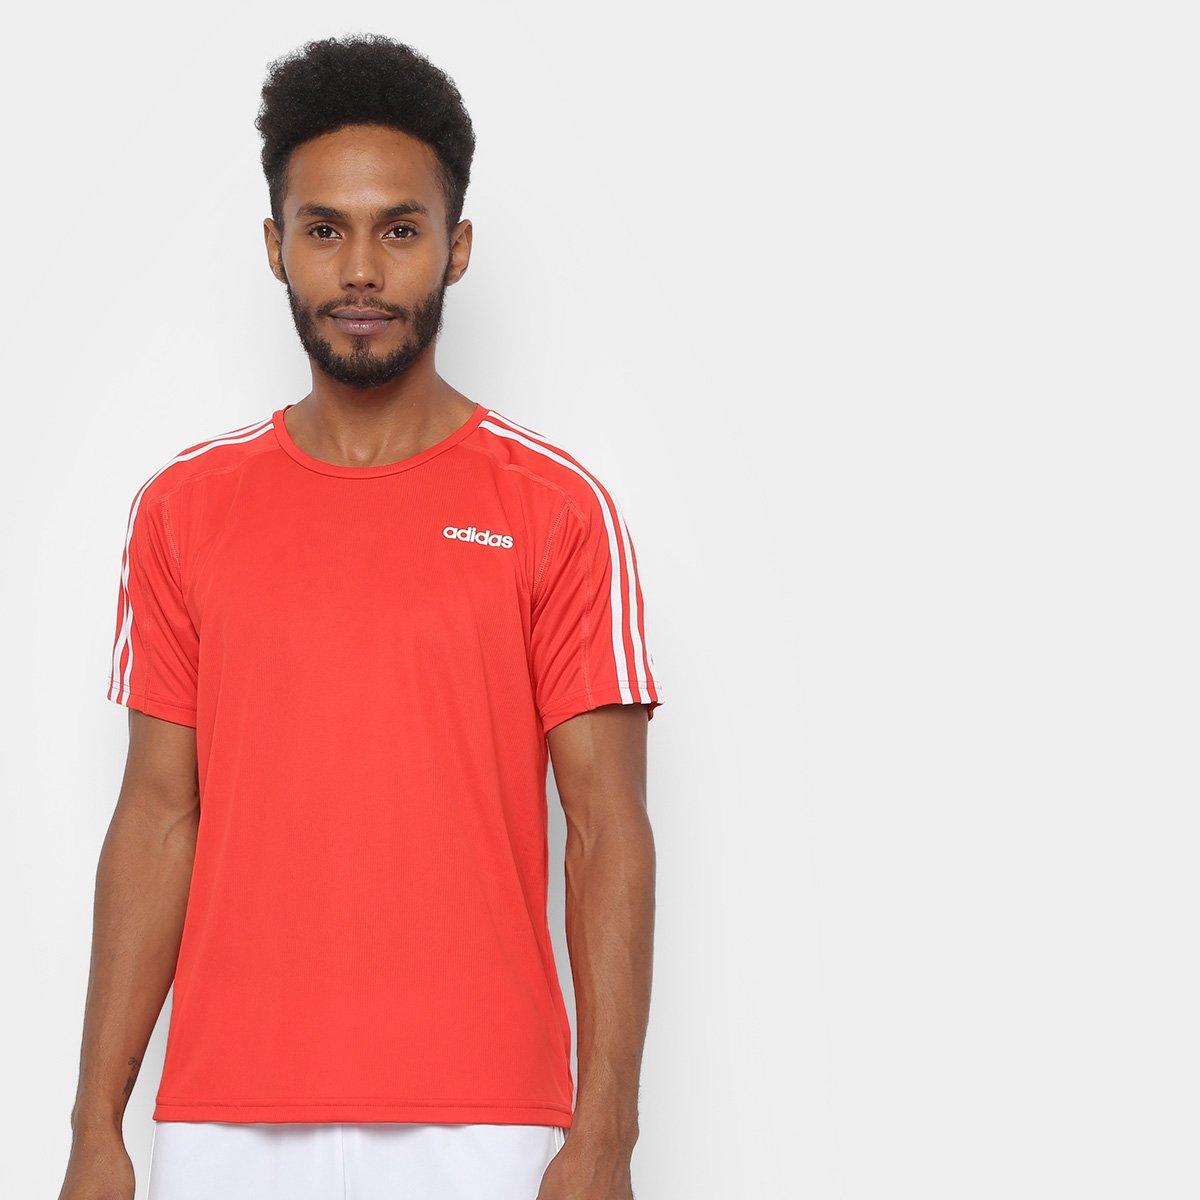 92145174be Camiseta Adidas Mc D2M Ht Masculino